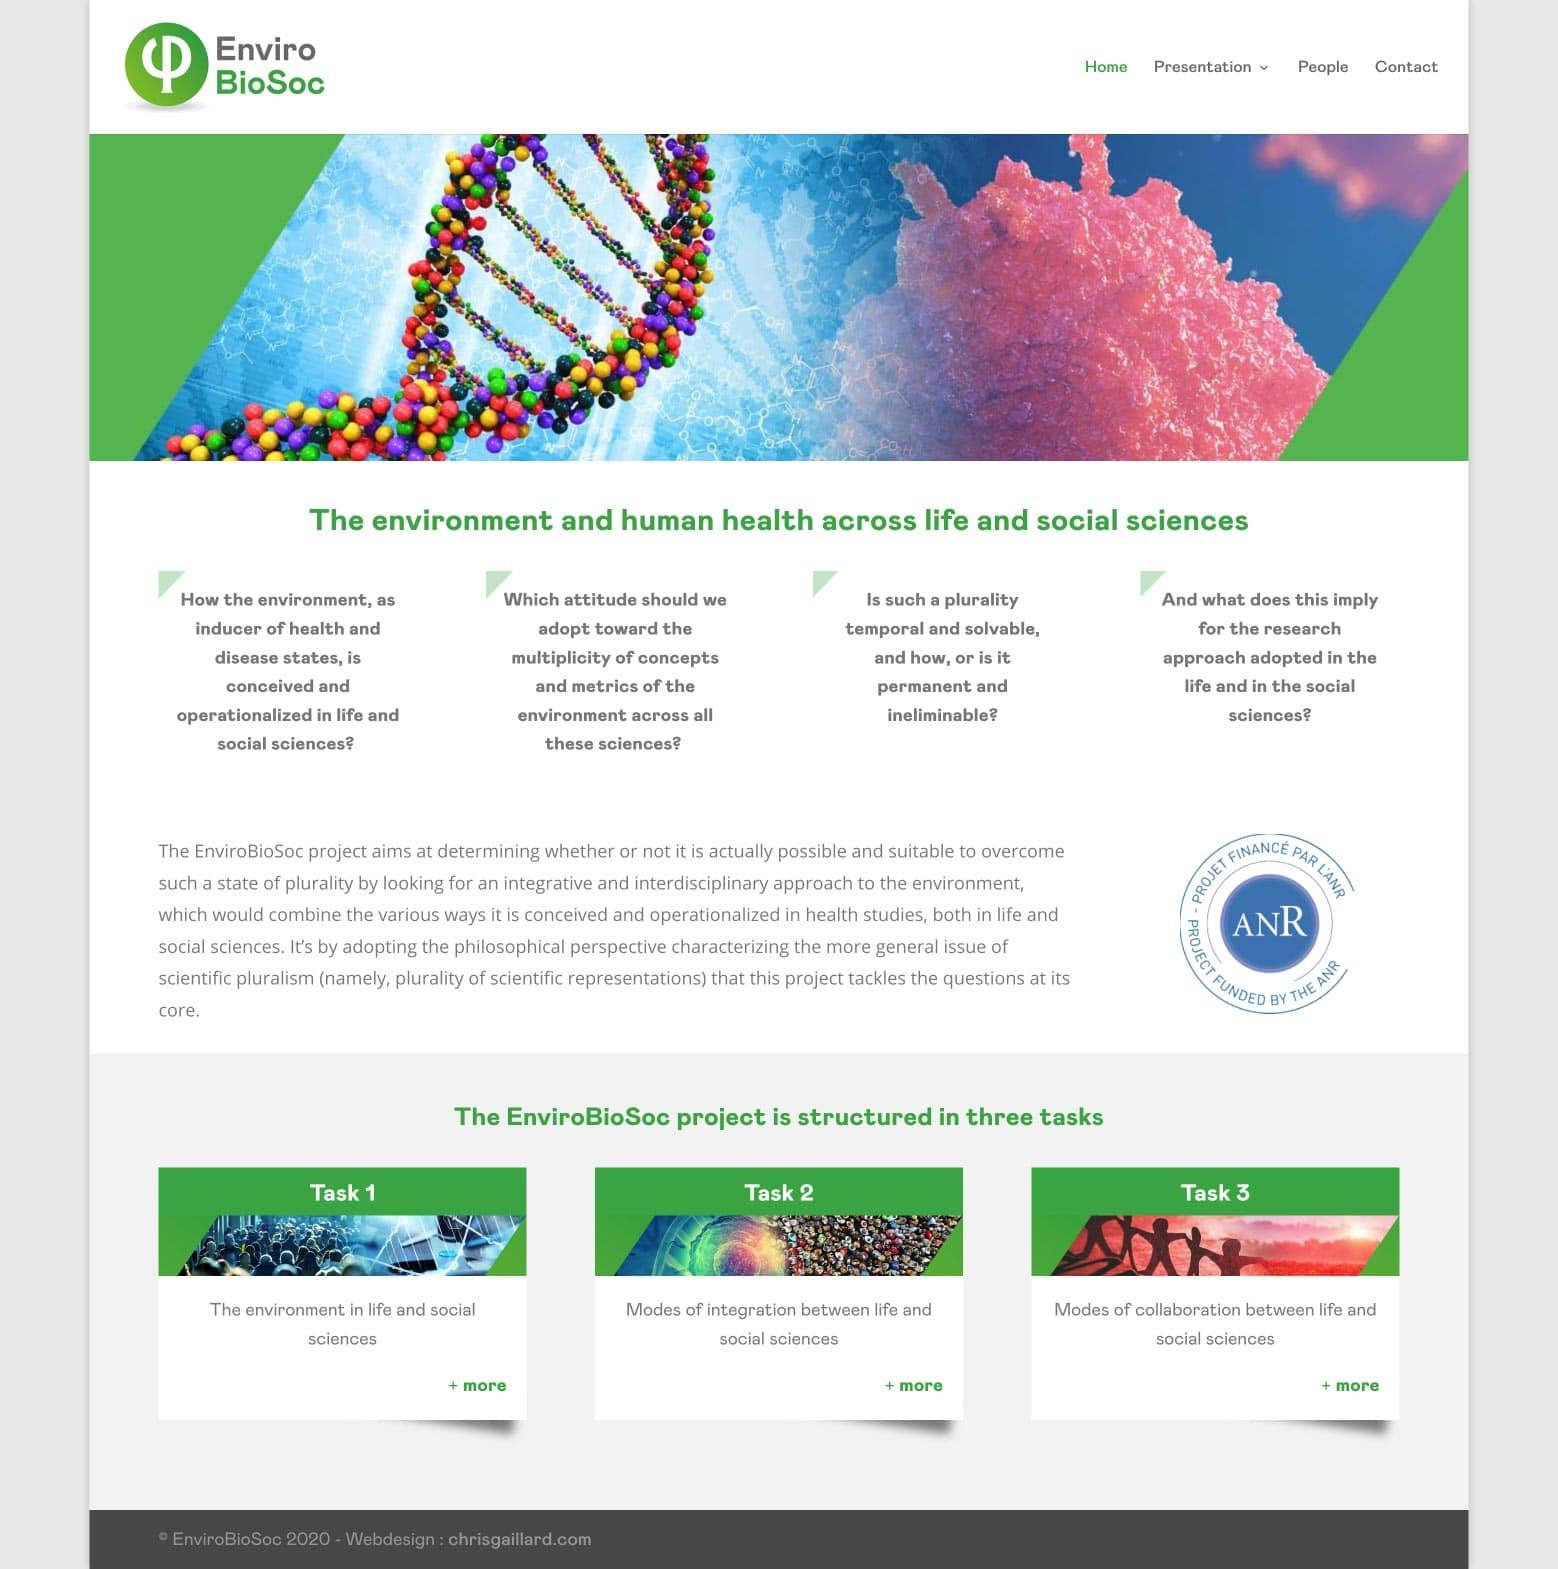 Création du logo Enviro BioSoc